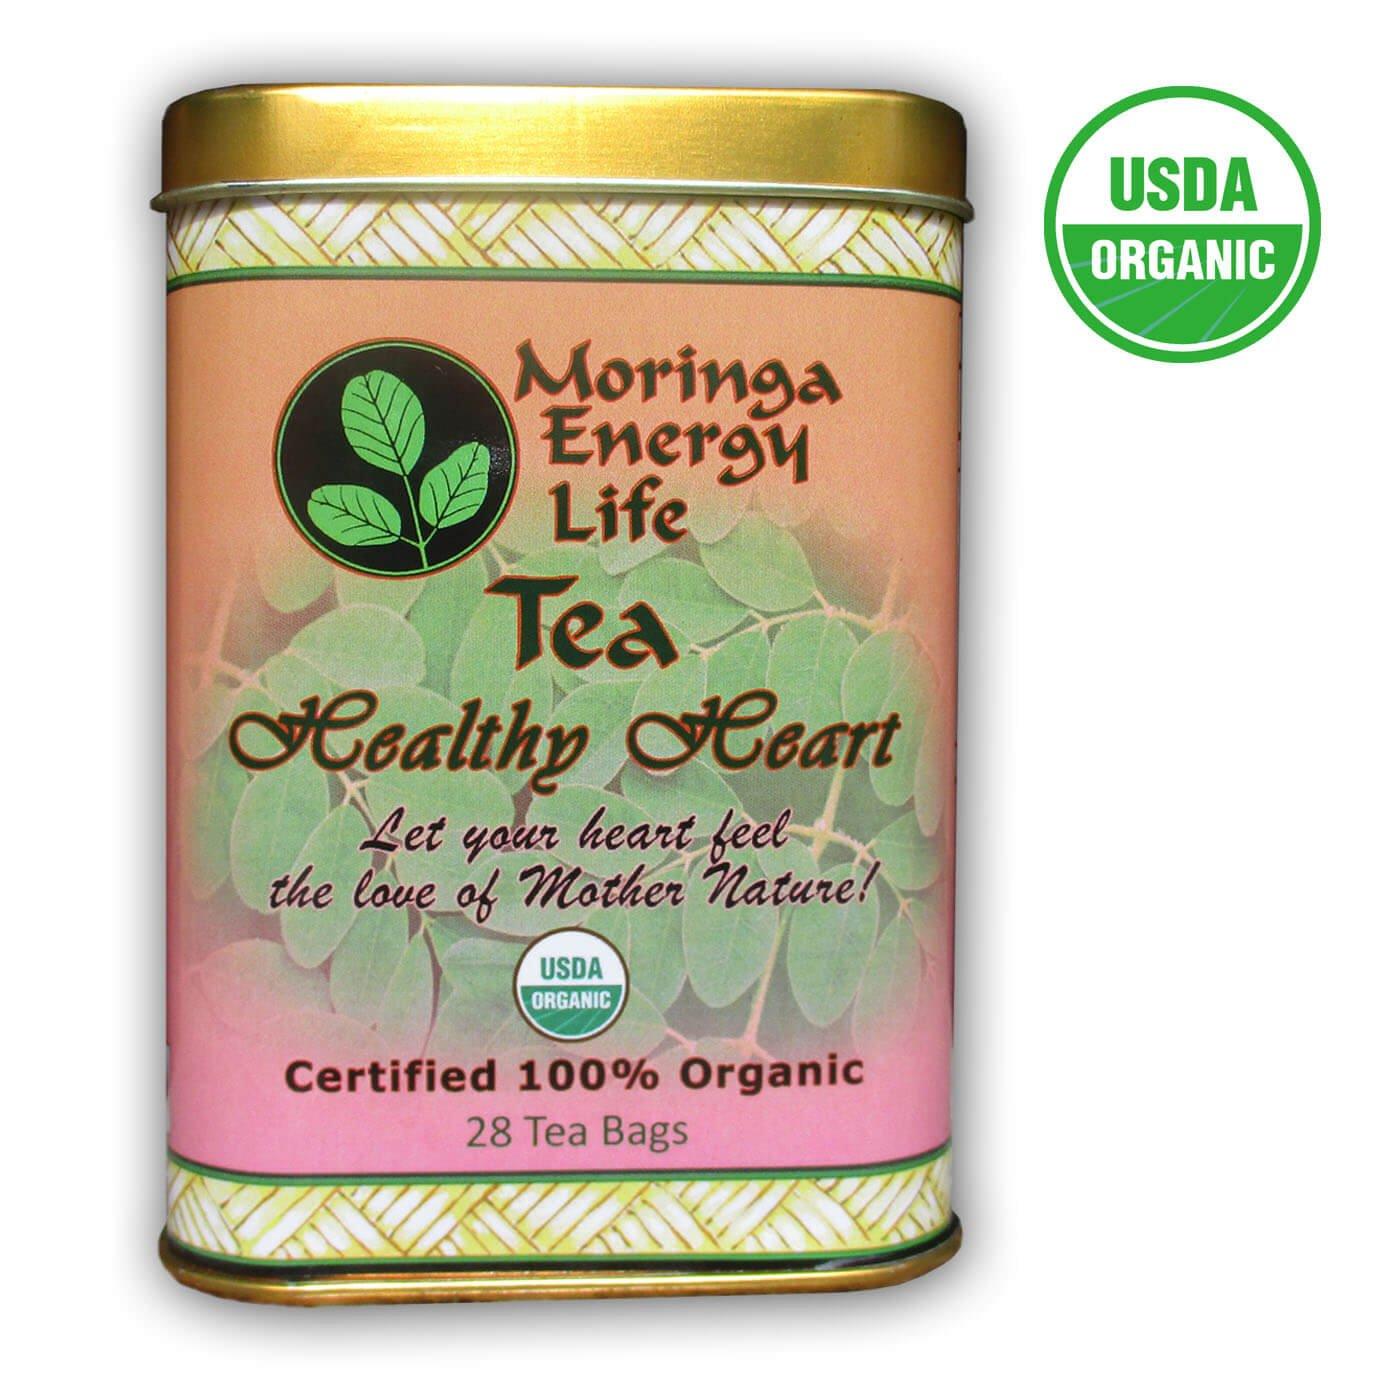 MORINGA HEALTHY HEART TEA - 100% USDA Organic - Let Your Heart Feel the Love of Mother Nature by Moringa Energy Life